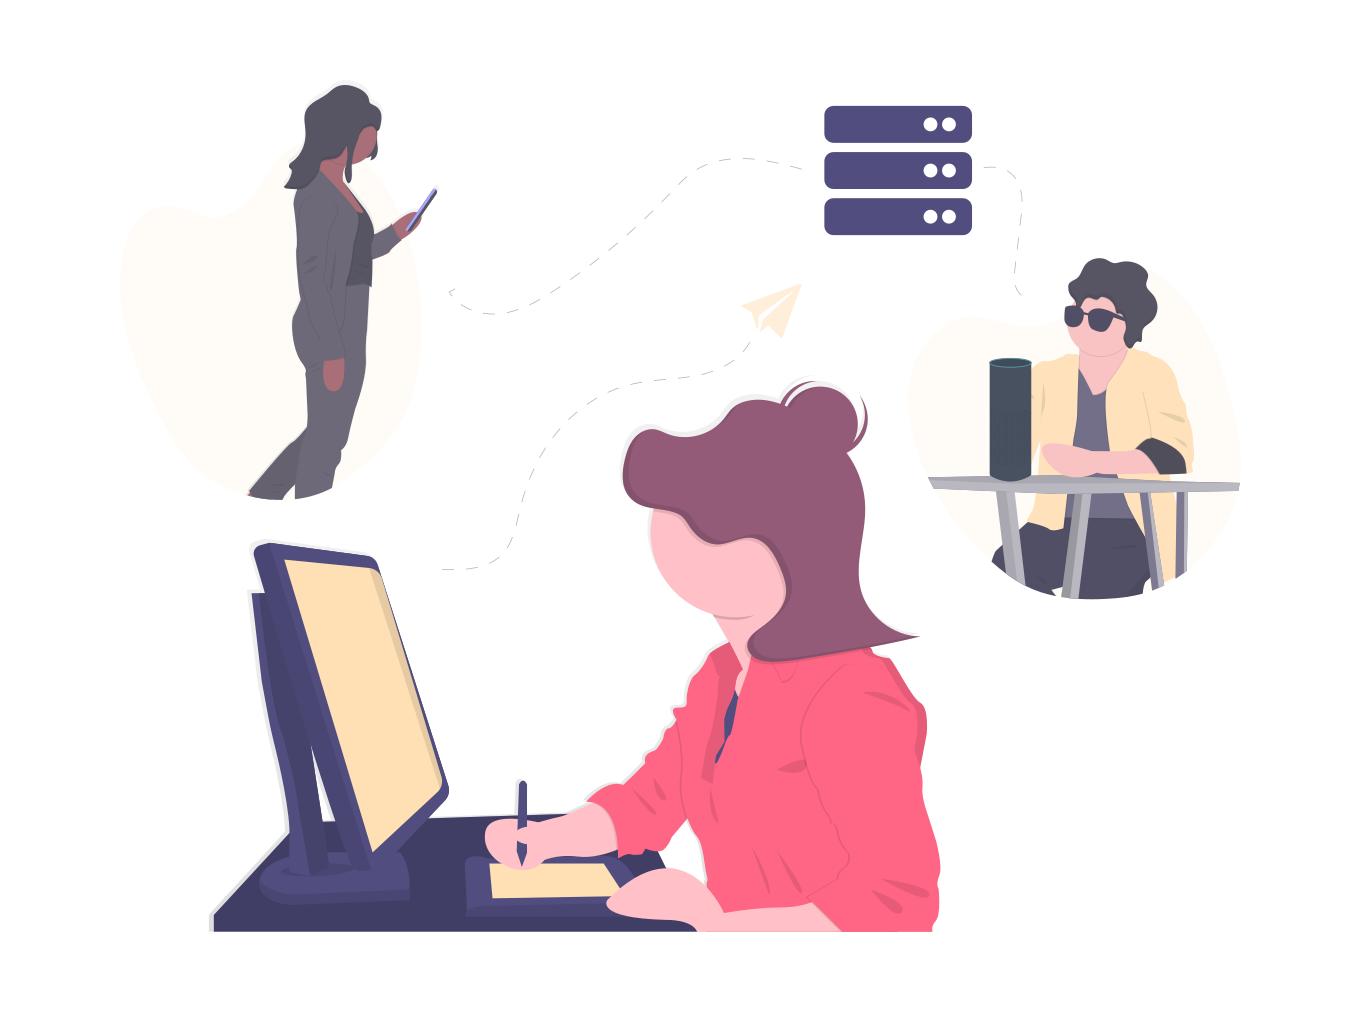 undraw_interaction_design_odgc (1)